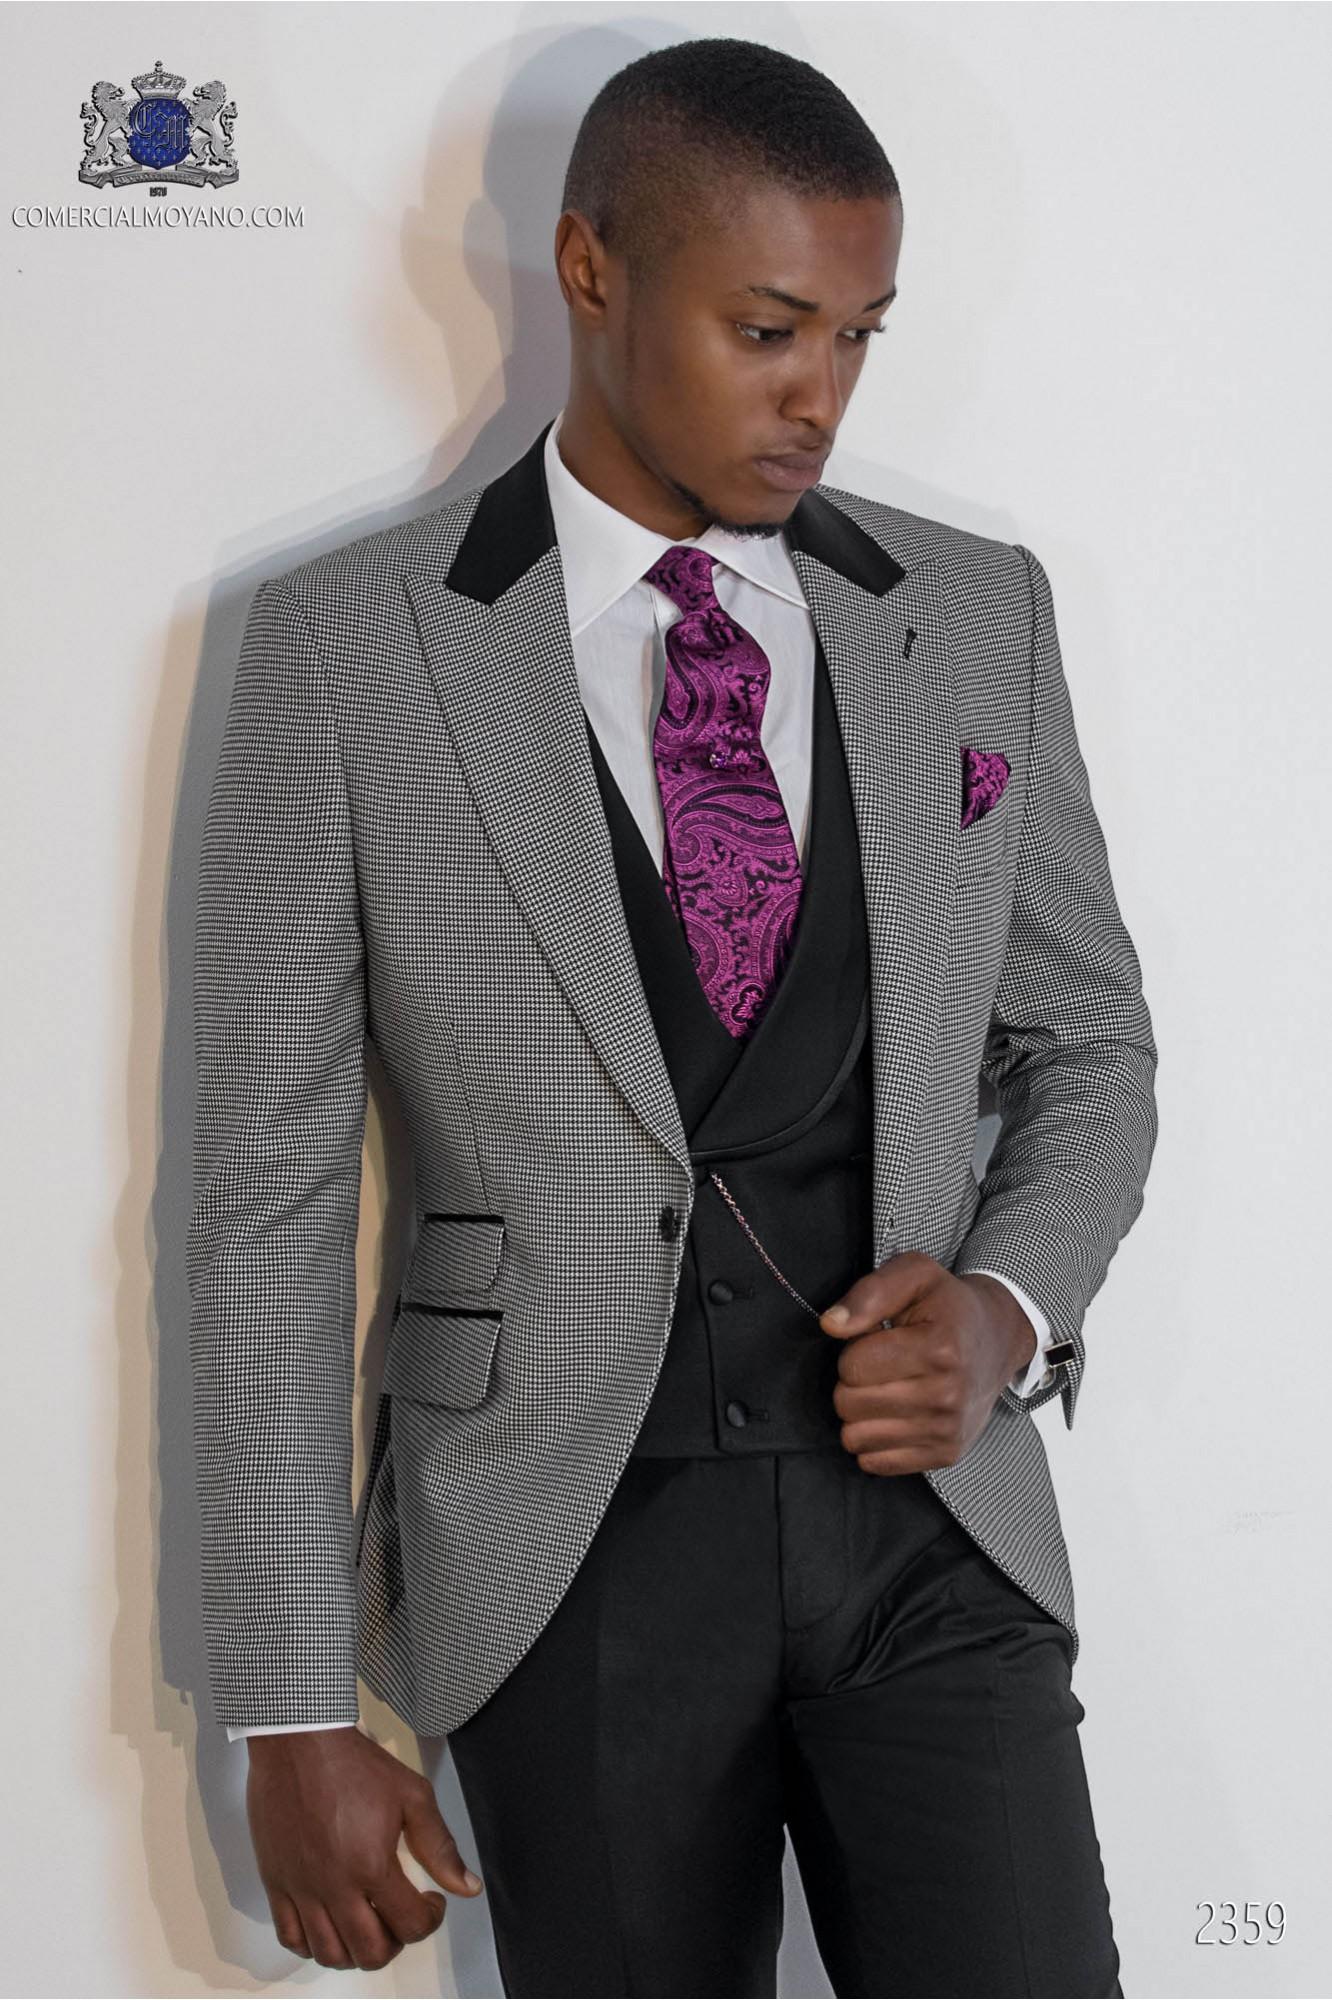 Italian fashion suit with modern cut